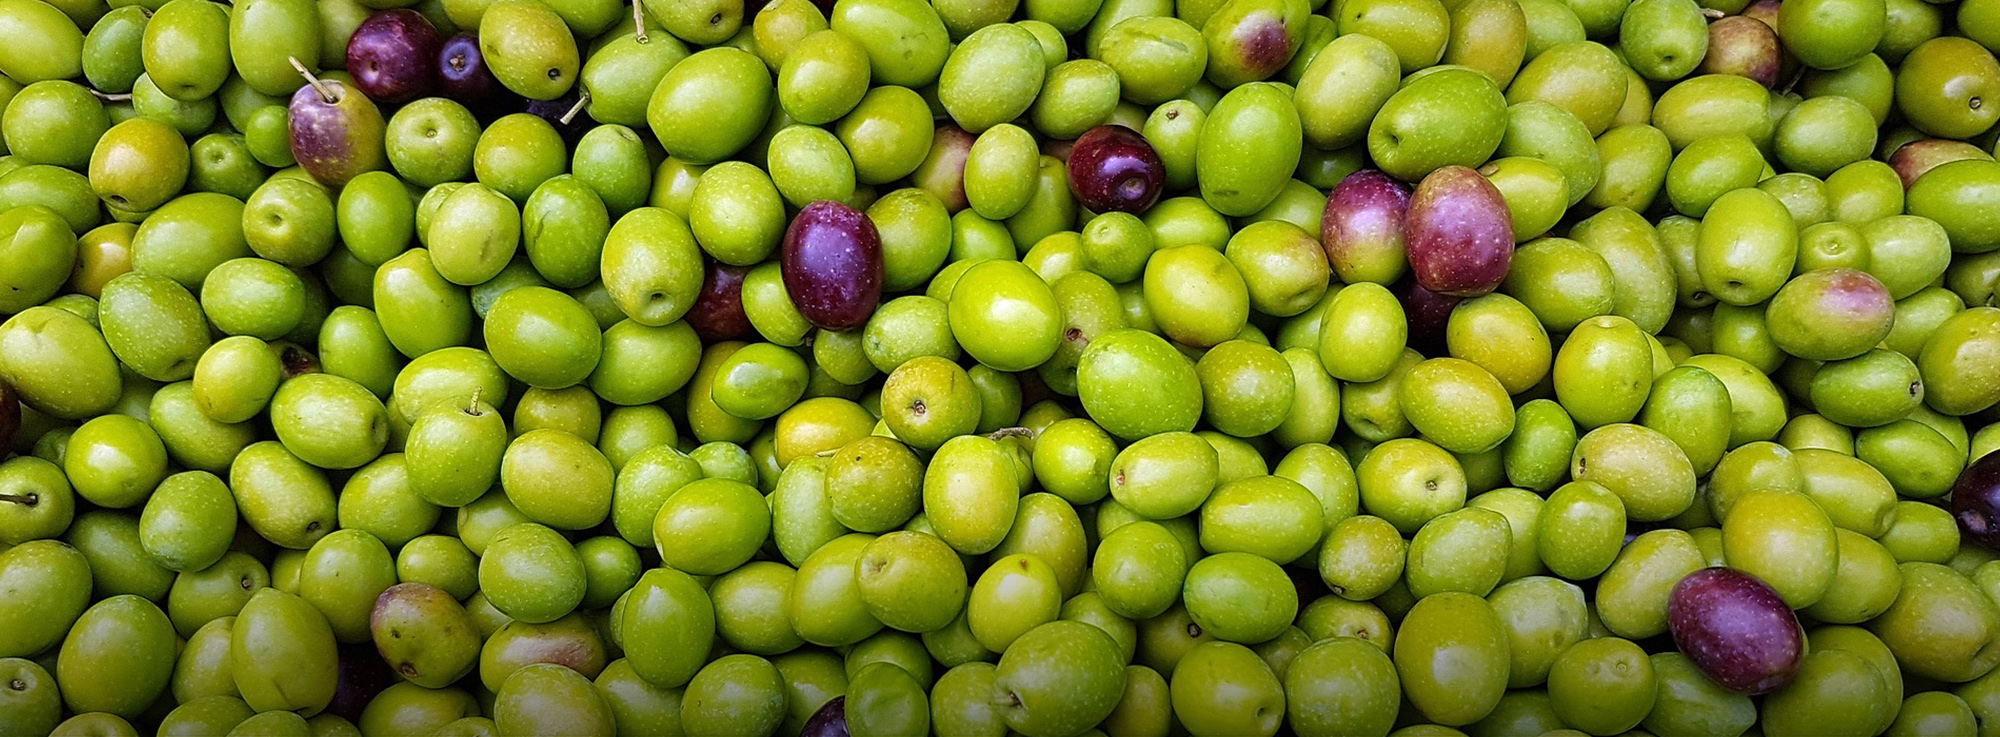 Ricetta: Olive dolci fritte